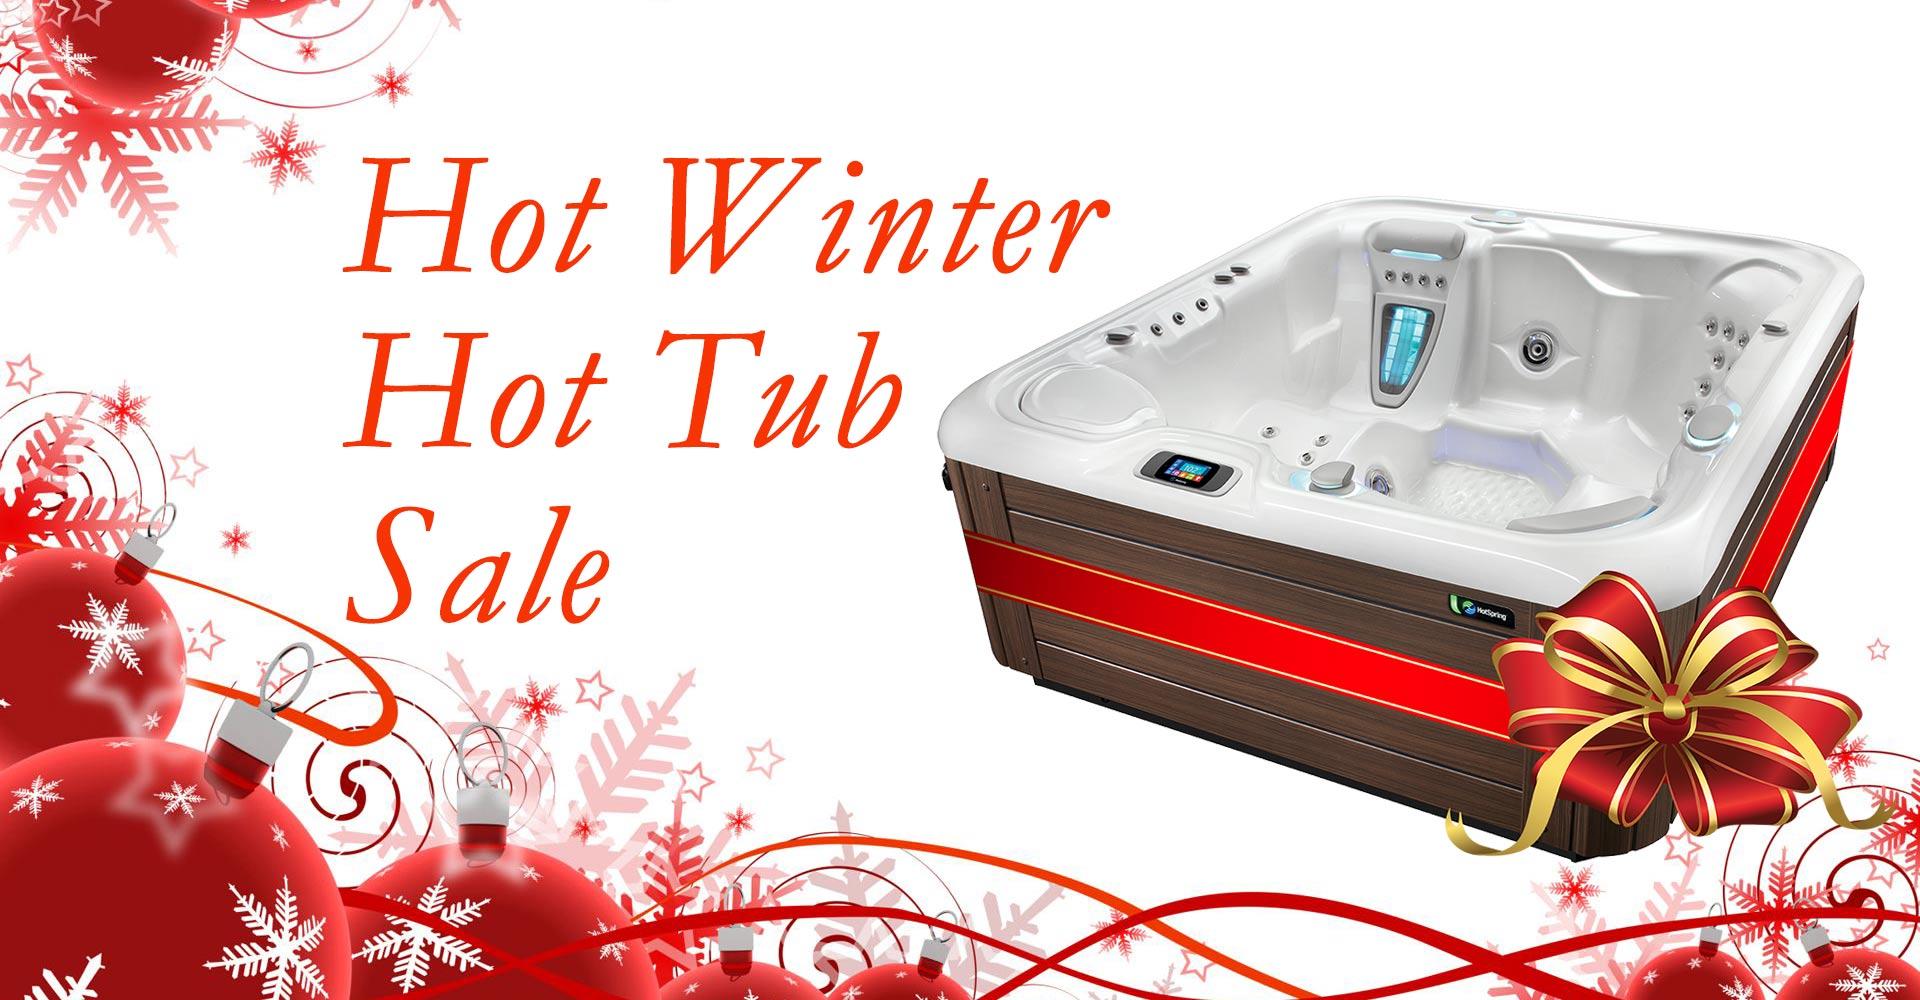 Hot Winter Hot Tub Sale